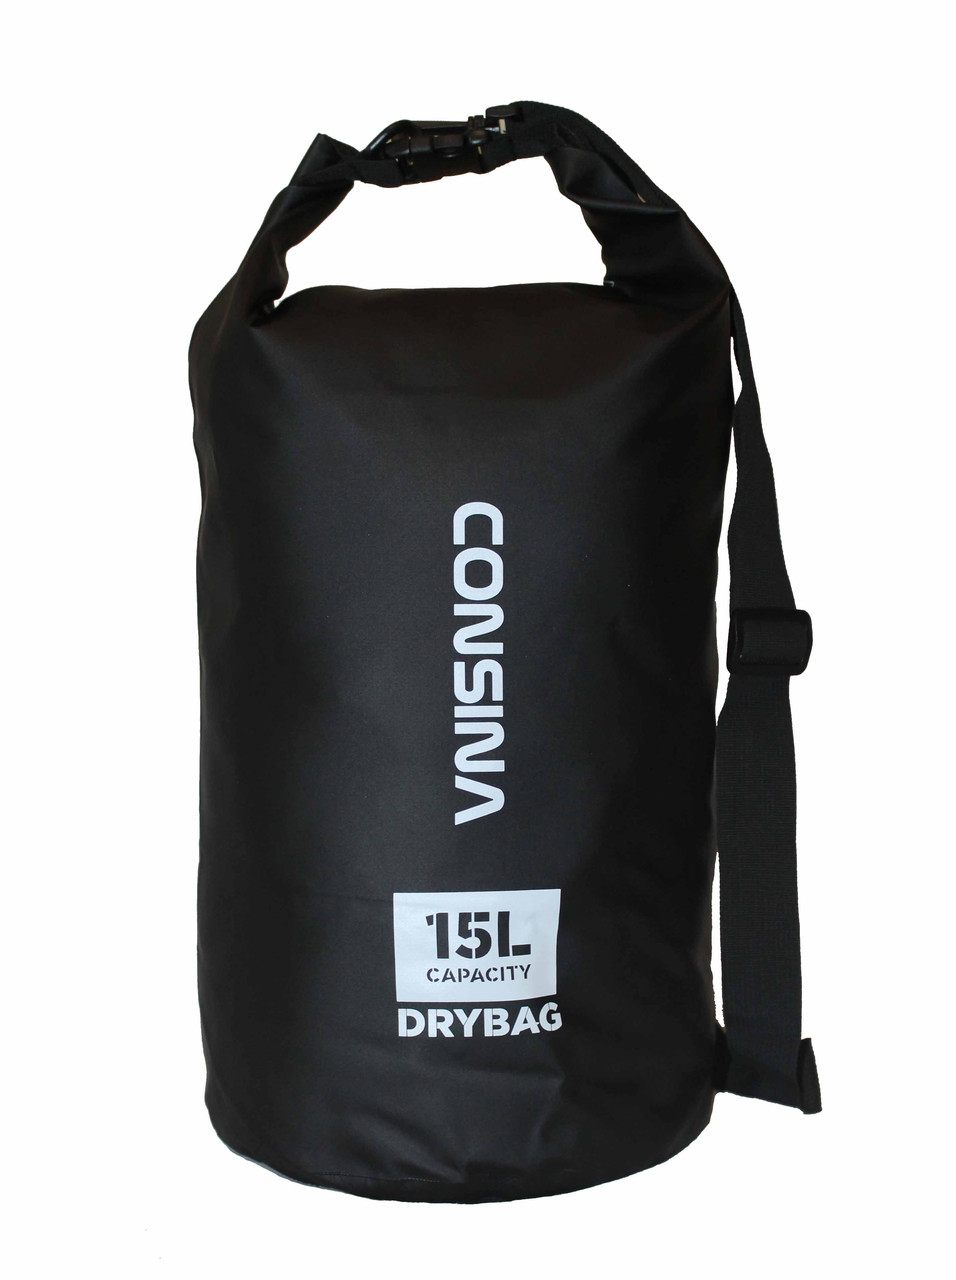 Сумка водонепроницаемая Consina Black 15L